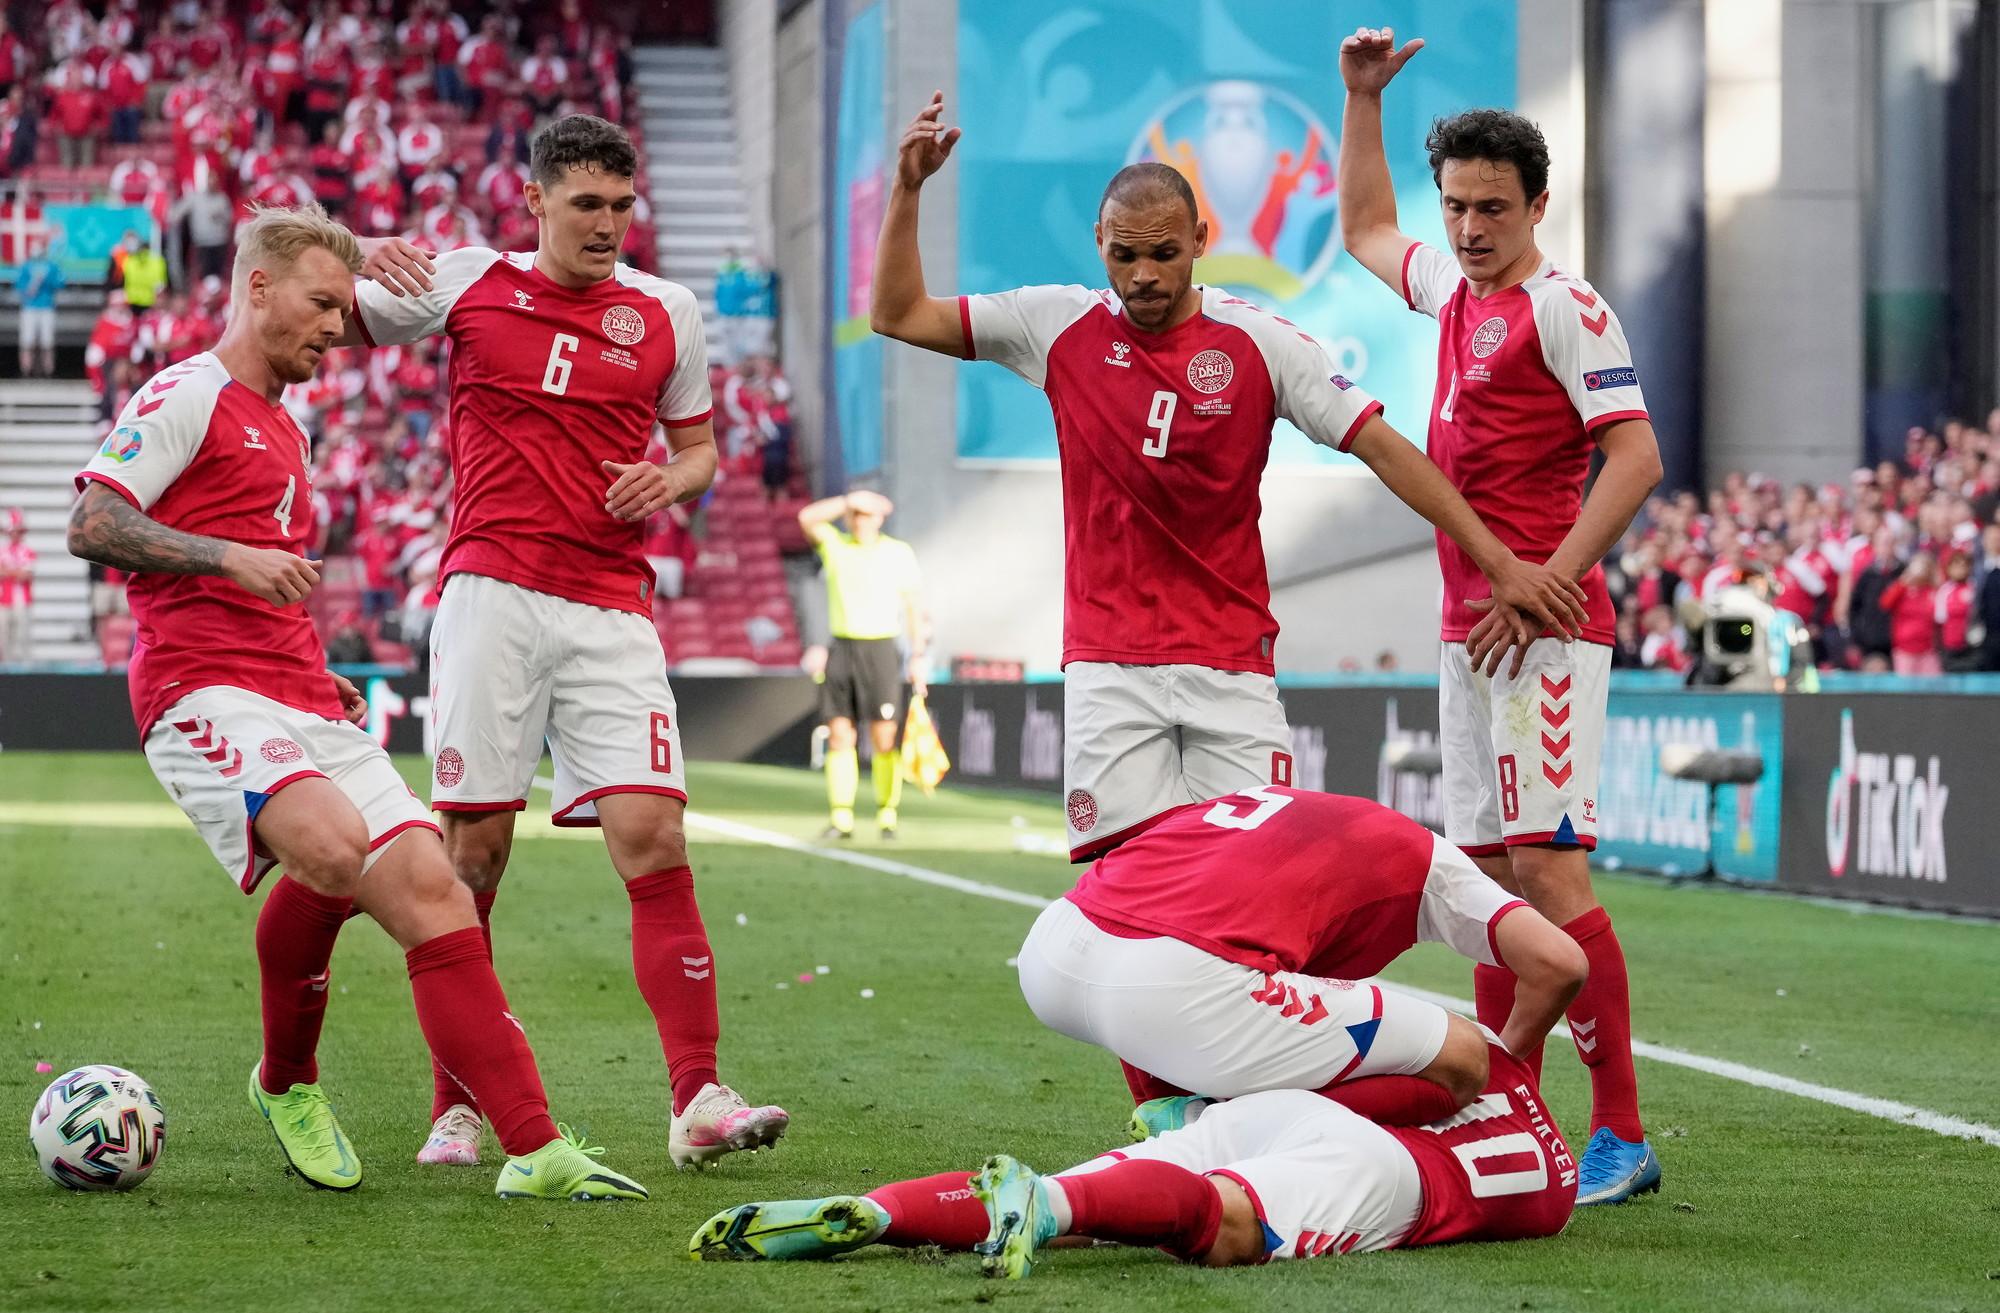 Sport Calcio: La Mia Inter 164931732-3c150680-8d57-4a15-9a1b-5d36e853ac9a